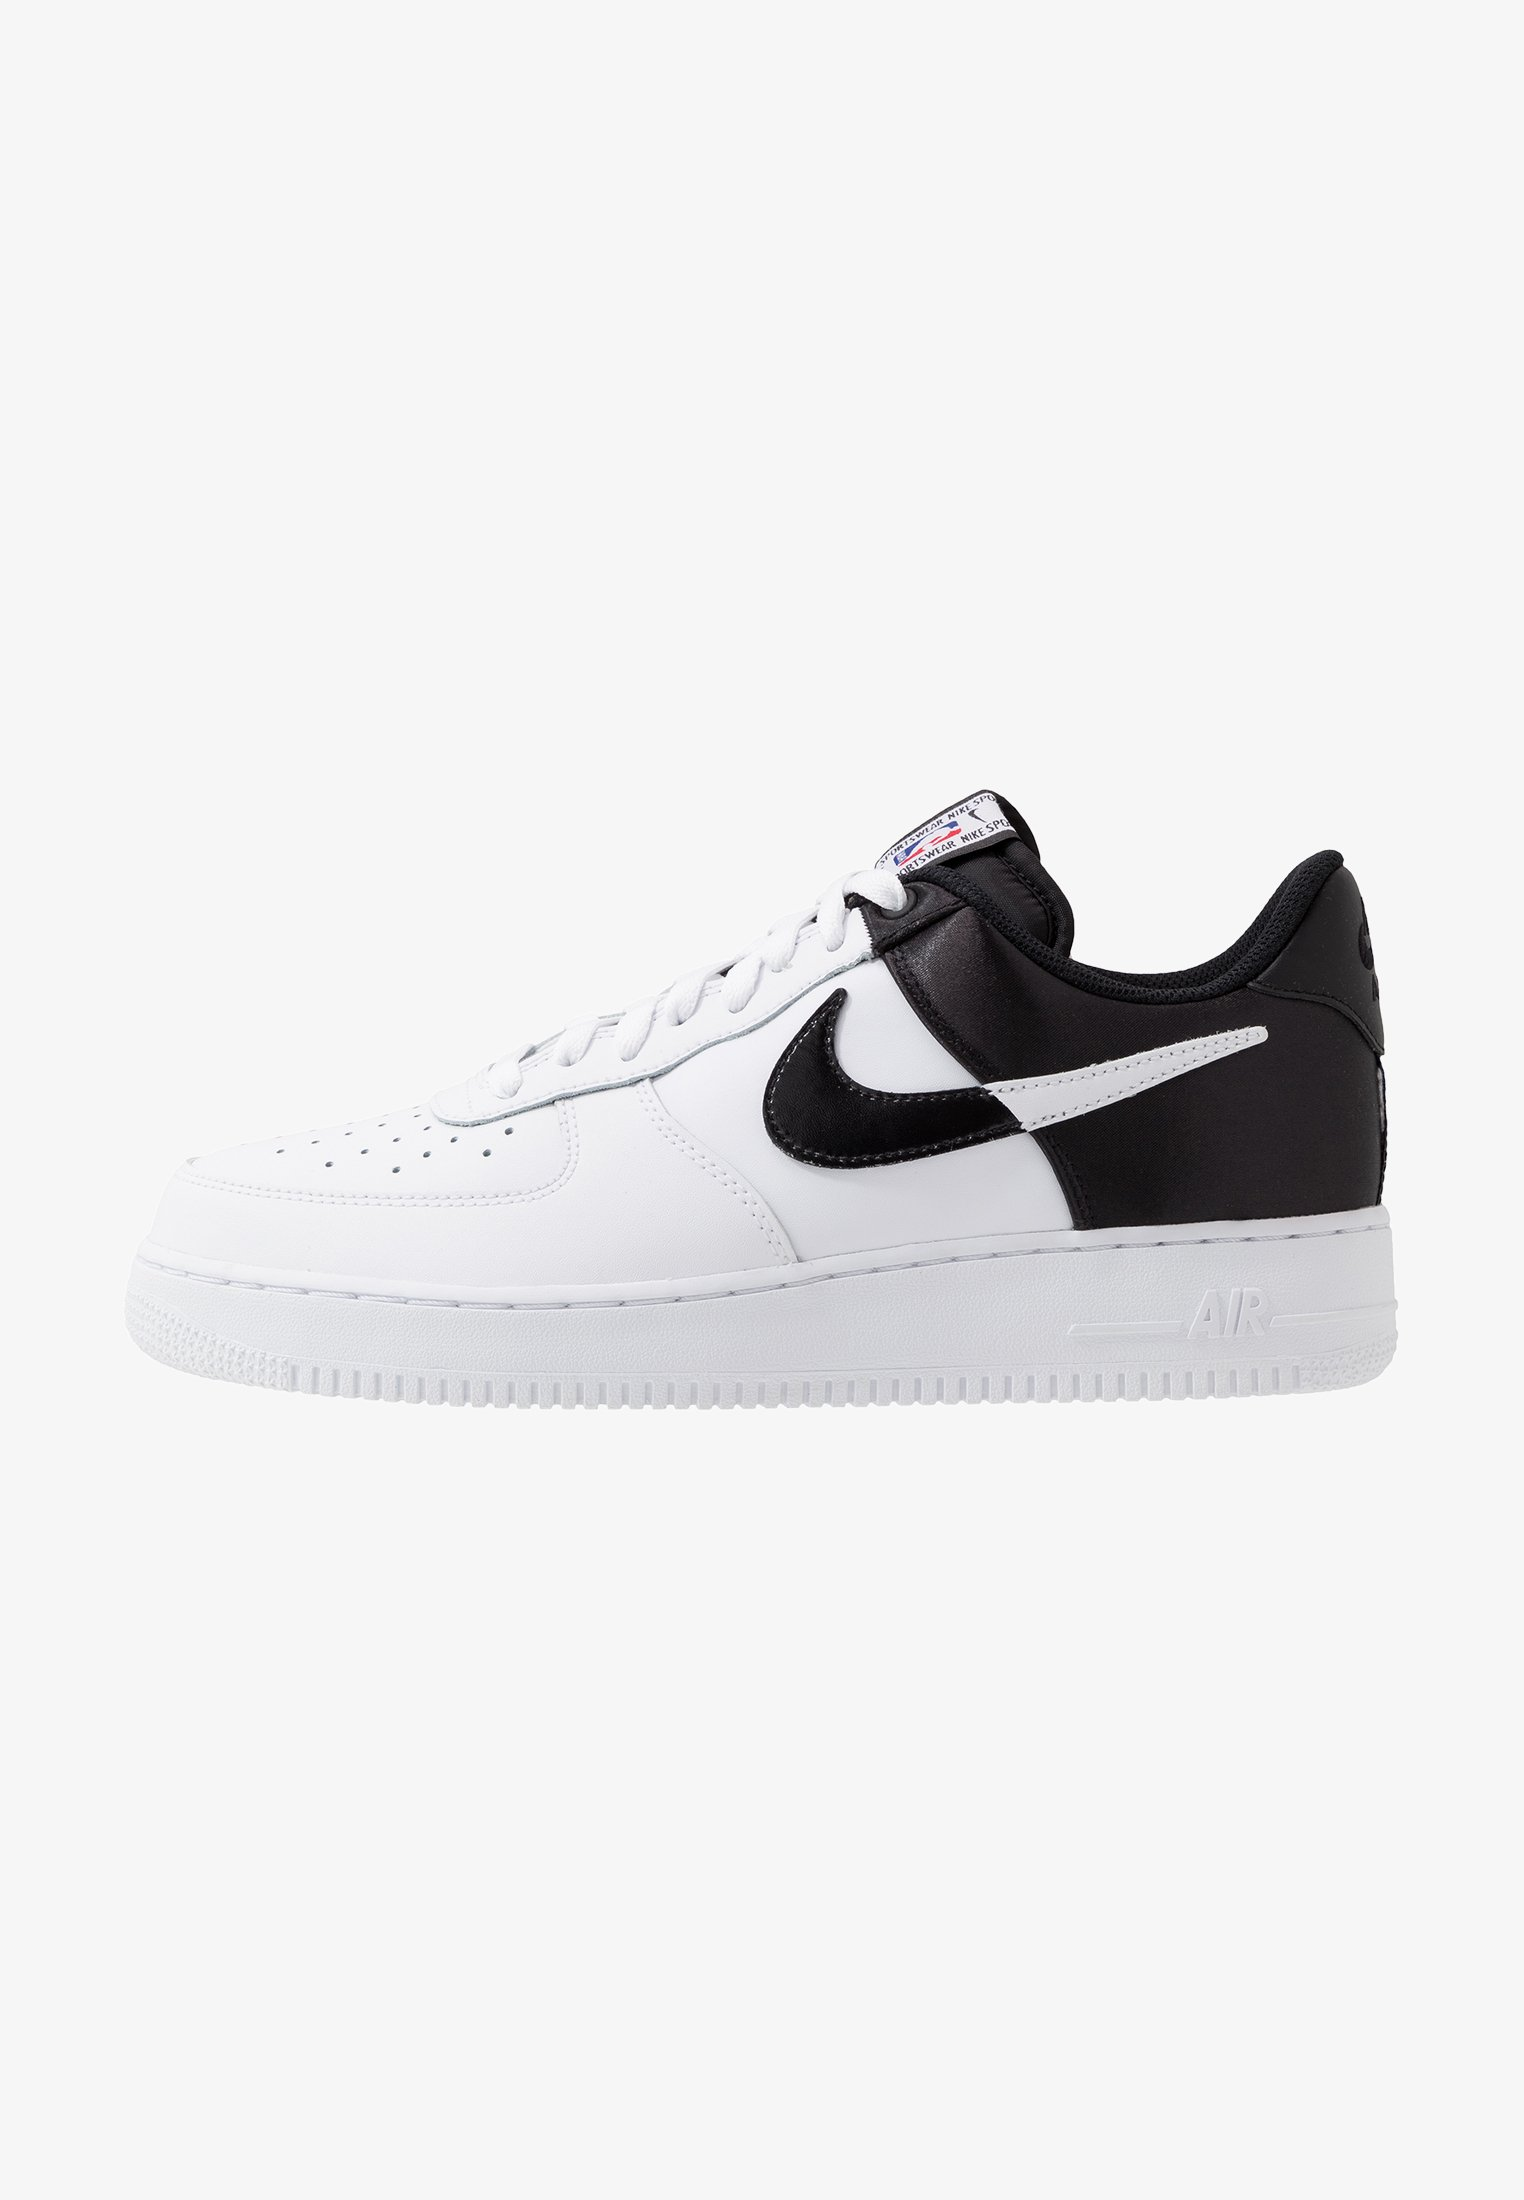 شكل مروع تنبيه Nike Sportswear Air Force 1 Zalando Blickrichter Com